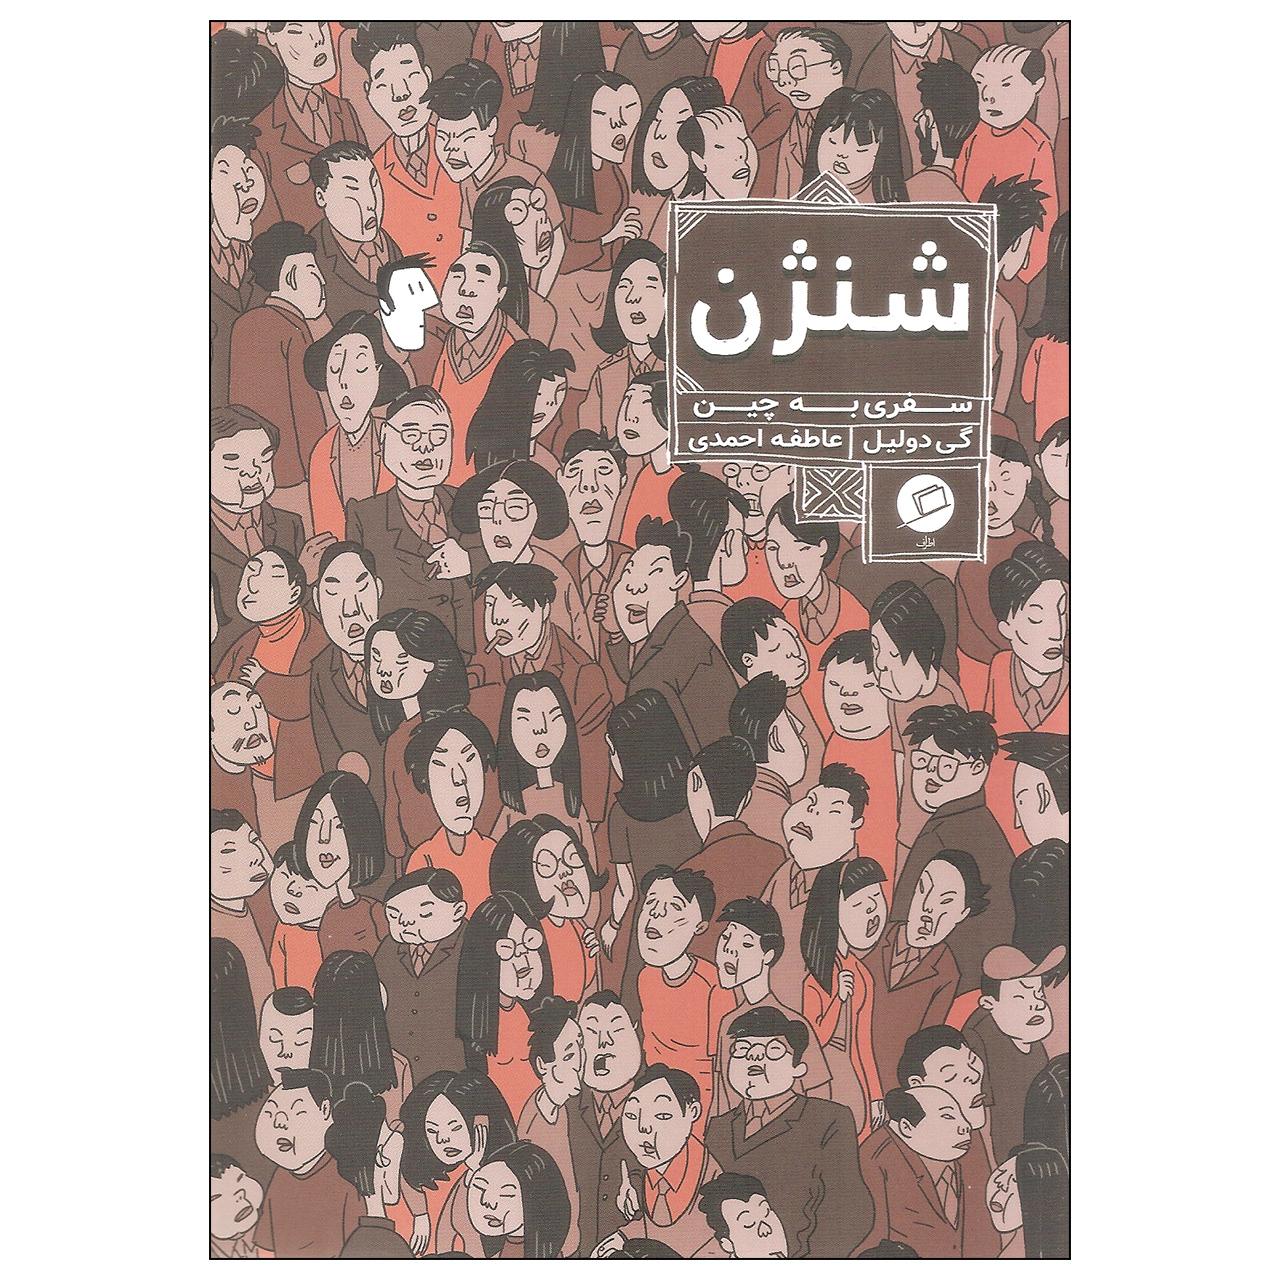 کتاب شنژن اثر گی دولیل نشر اطراف